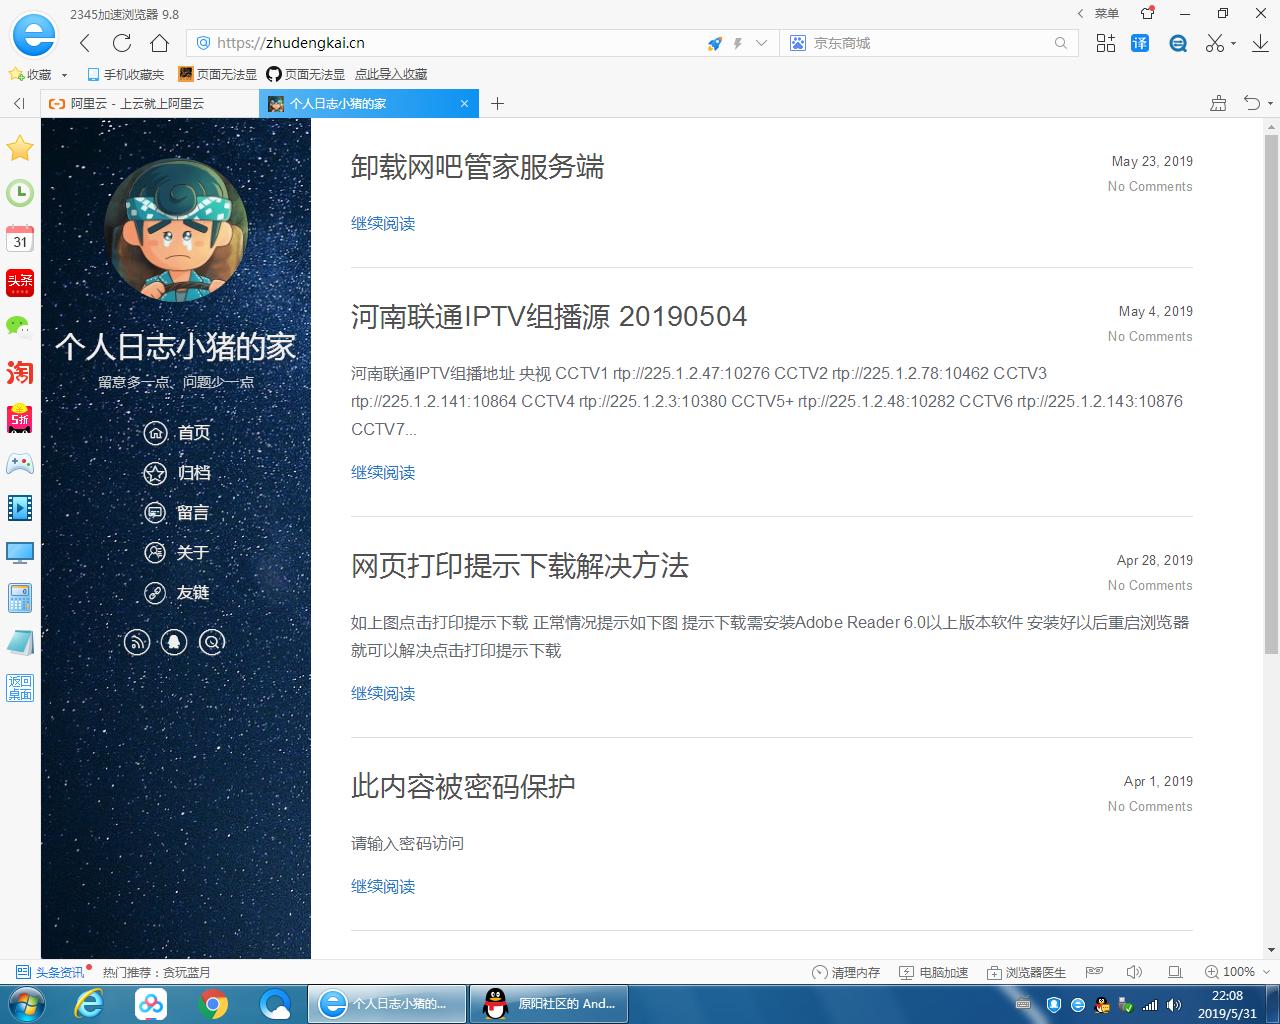 博客页面.png